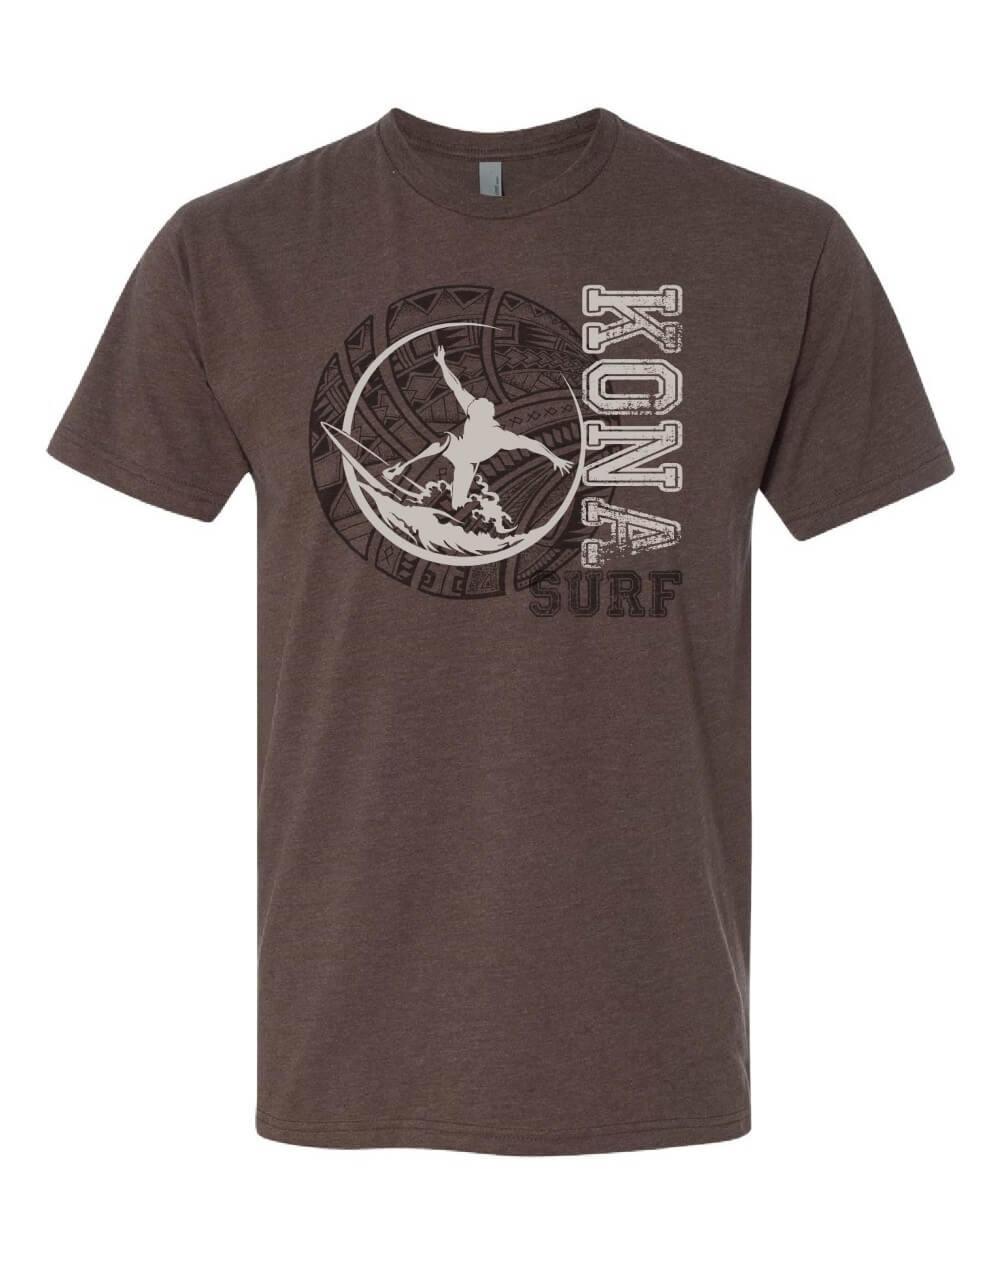 Broken Arrow Wear T Shirt Printing Custom T Shirts All